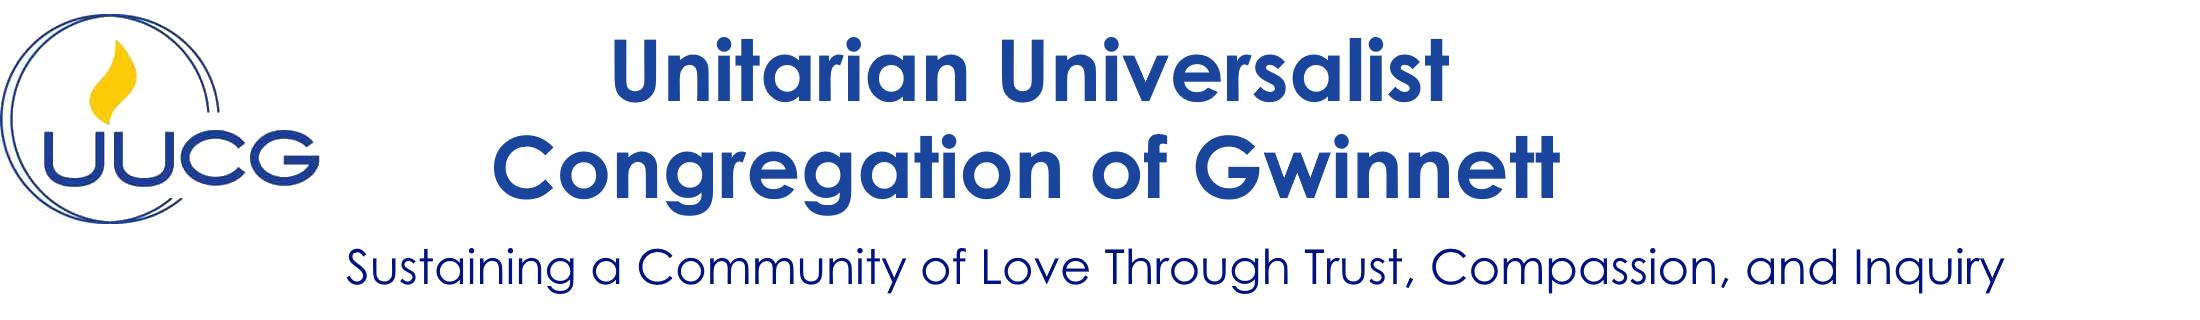 Unitarian Universalist Congregation of Gwinnett Logo